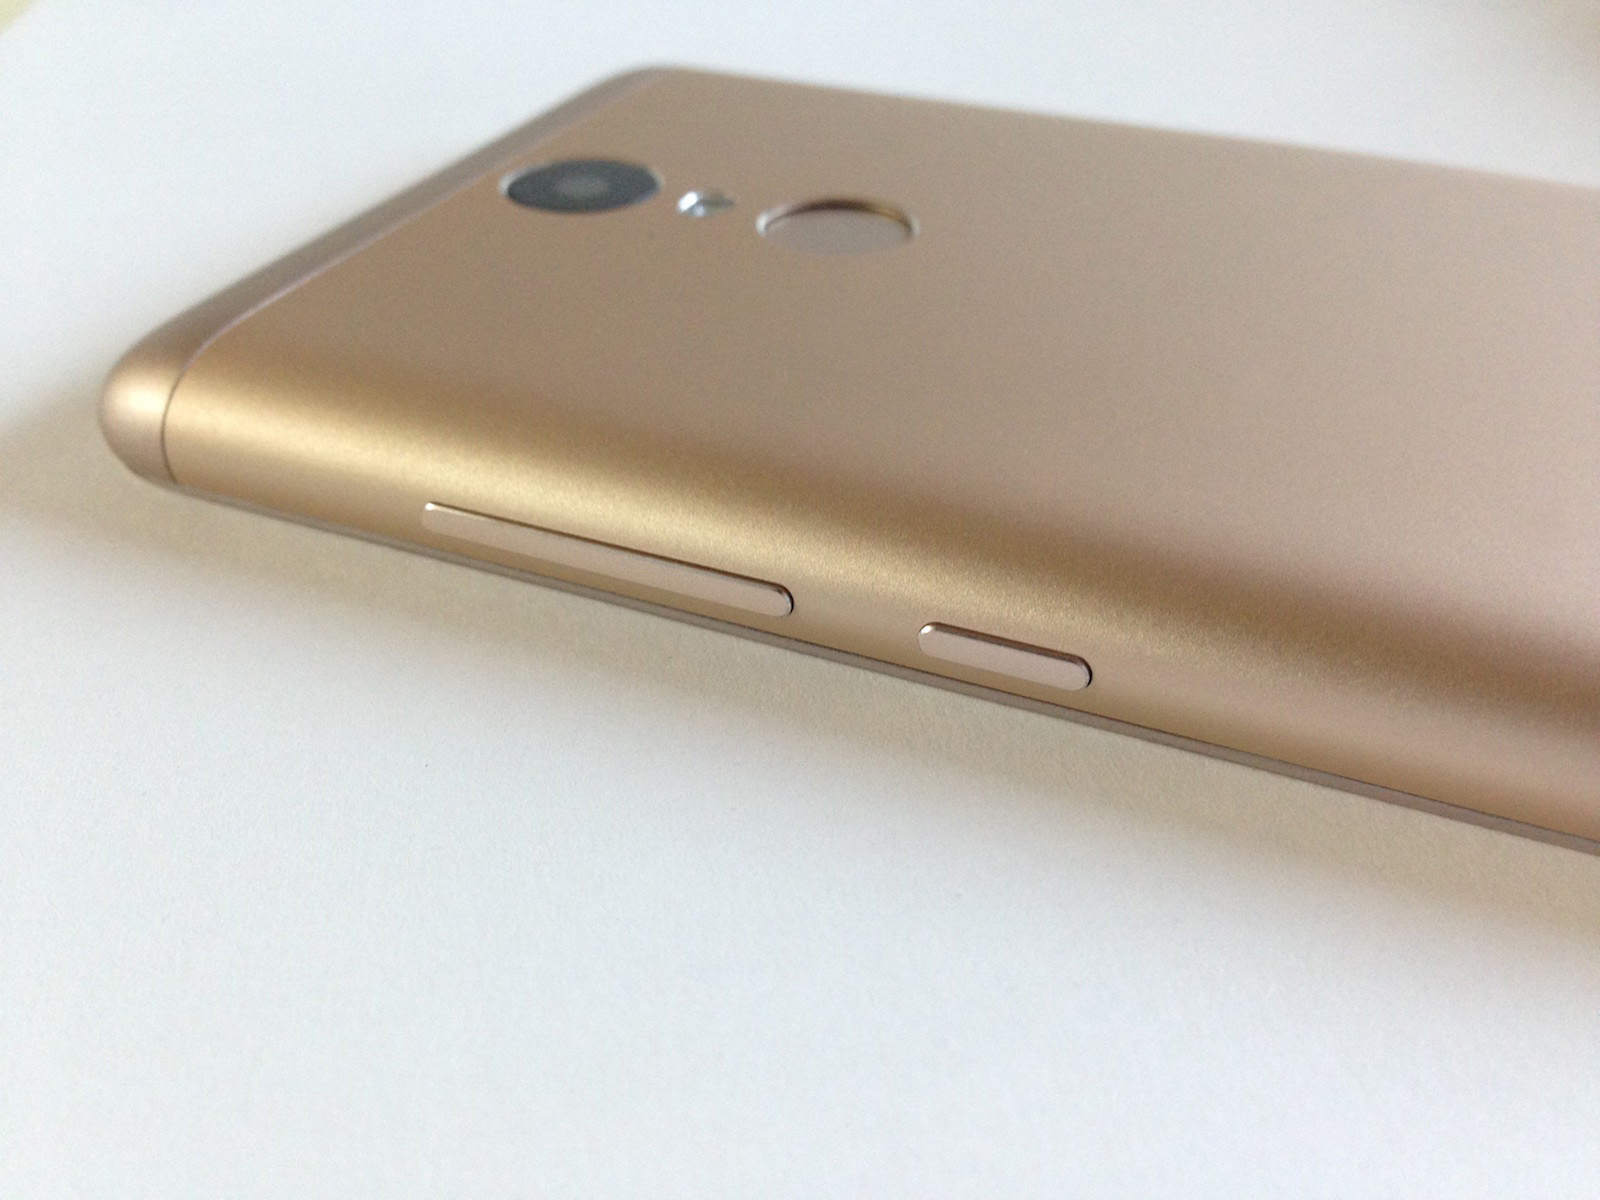 Xiaomi Redmi Note 3 Pro 音量調節ボタン 電源ボタン